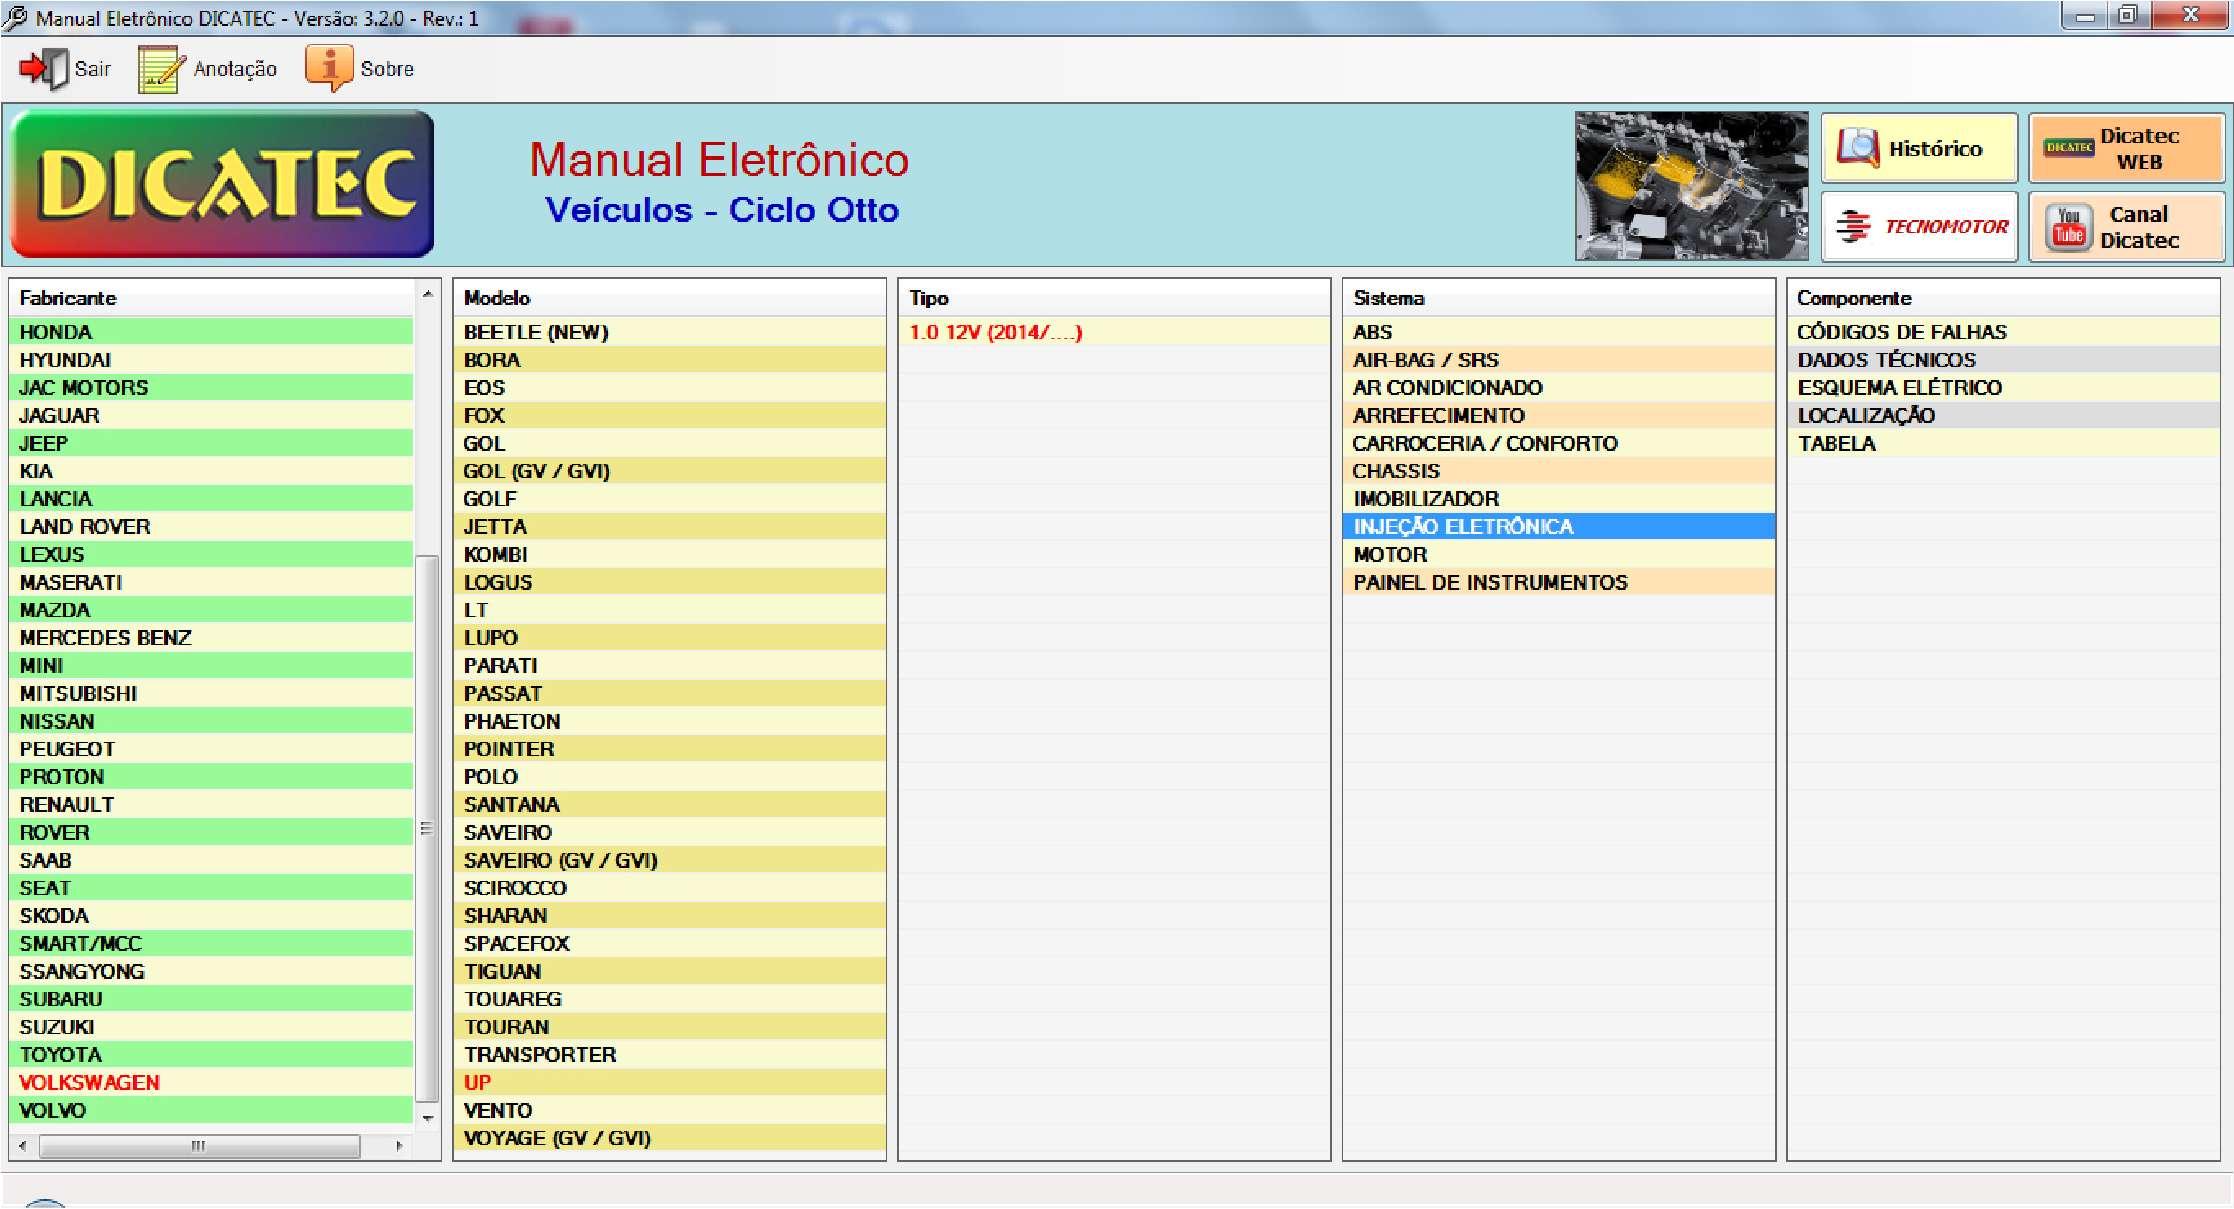 Dicatec database SS-01